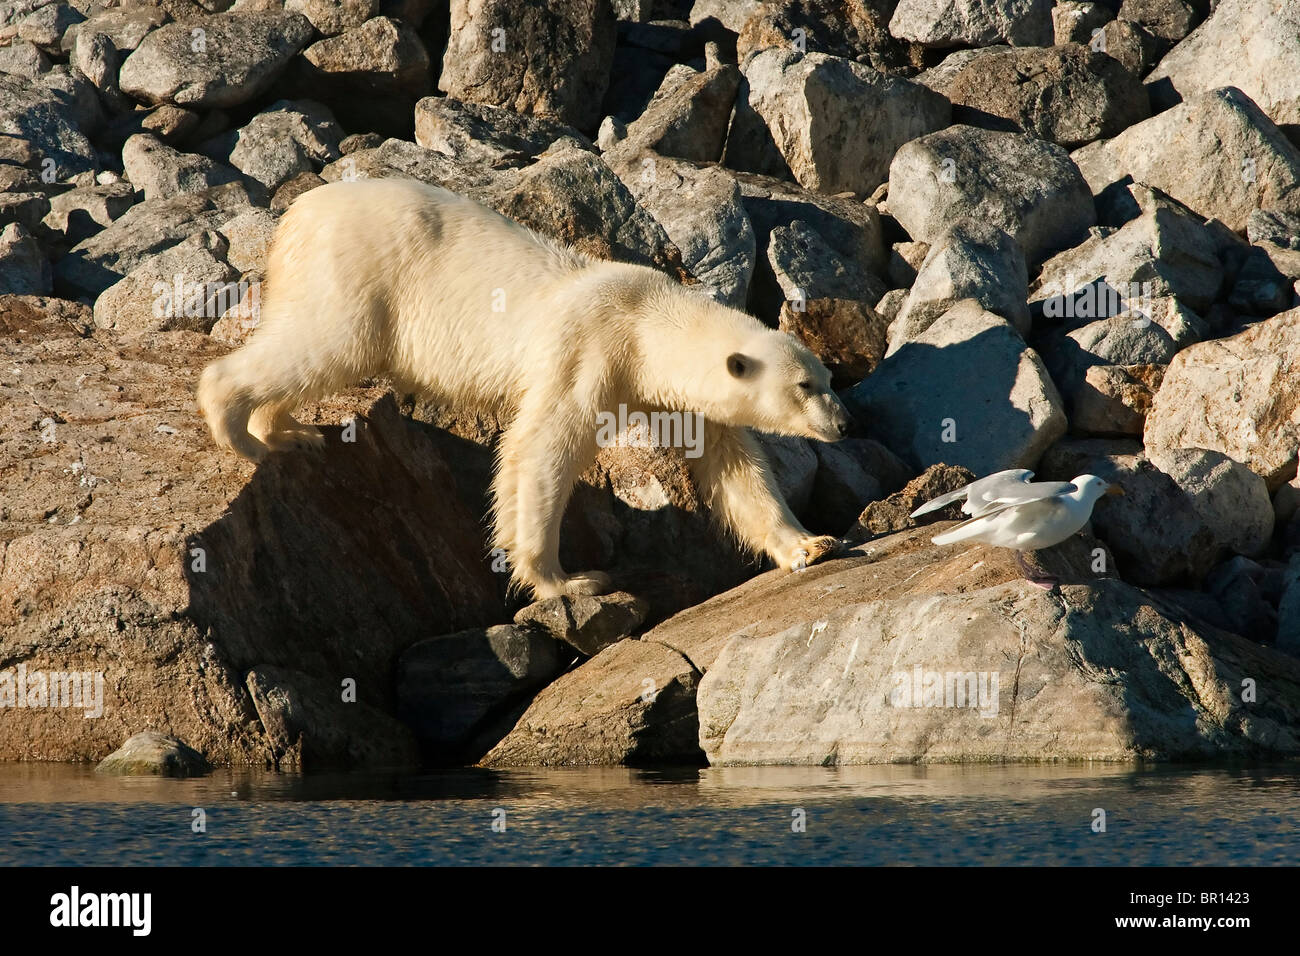 POLAR BEAR (Ursus maritimus) walking over boulders on seashore - Stock Image